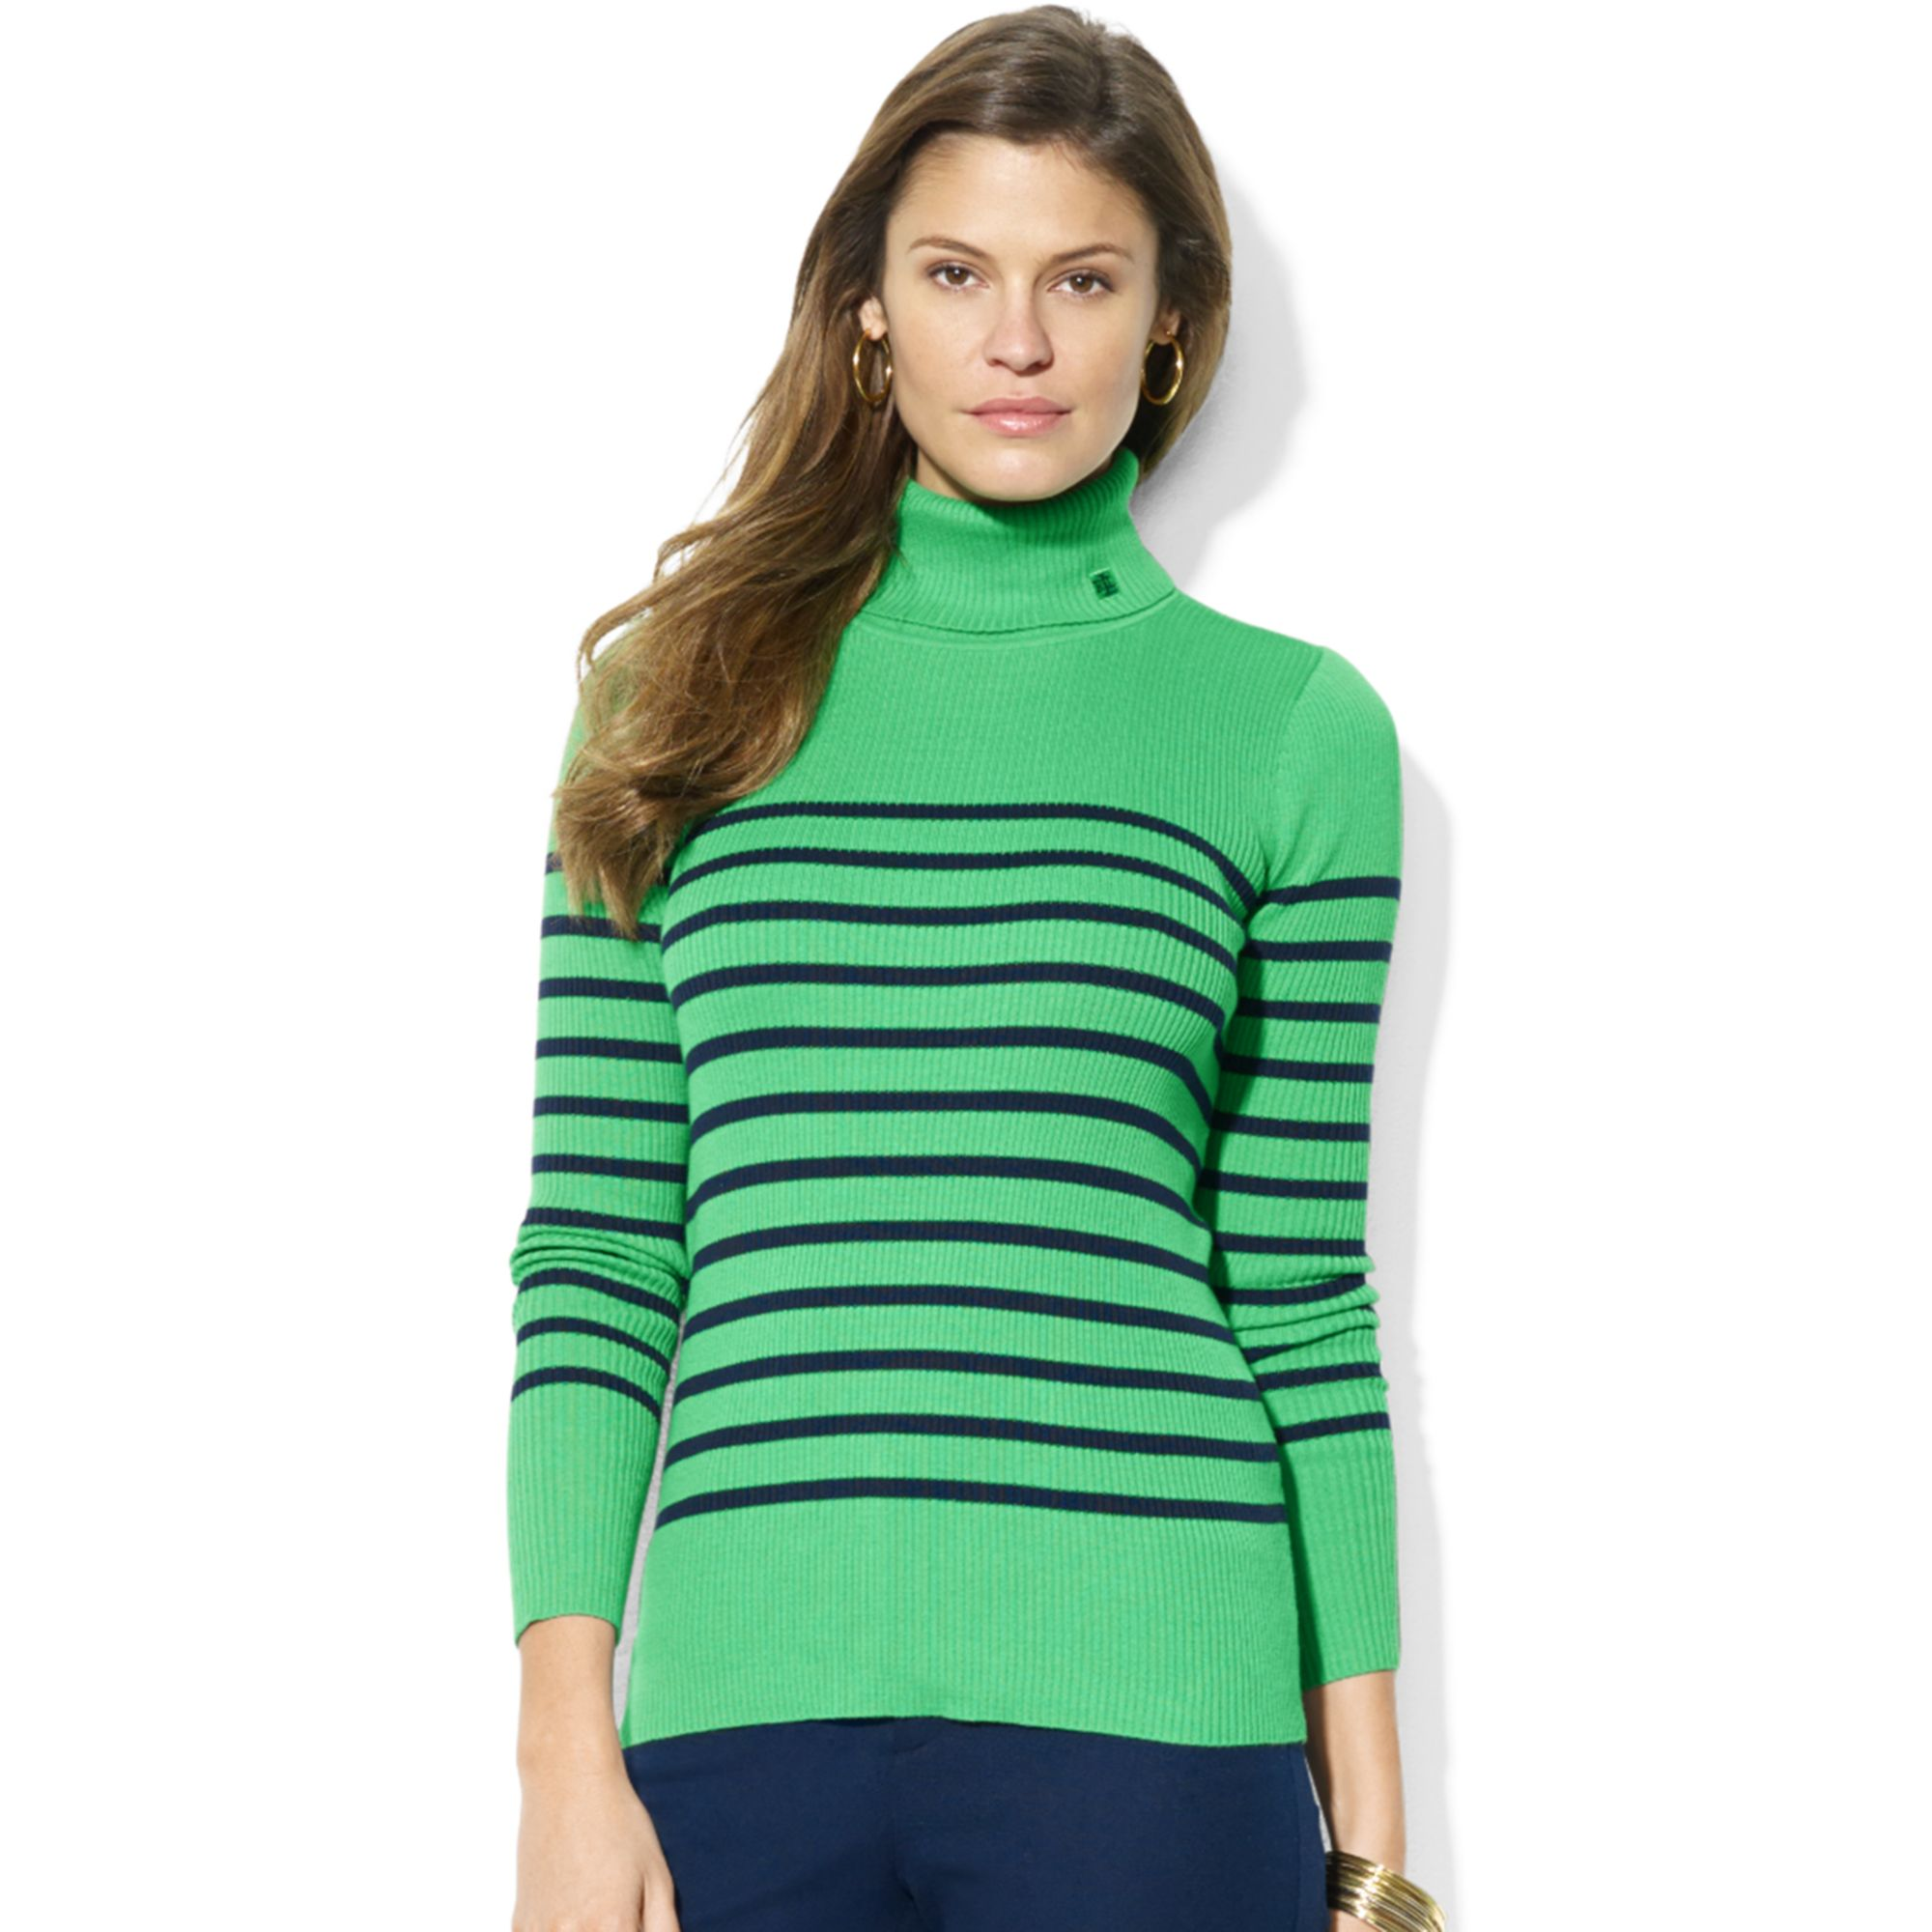 Lauren by ralph lauren Long Sleeve Striped Turtleneck in Green | Lyst